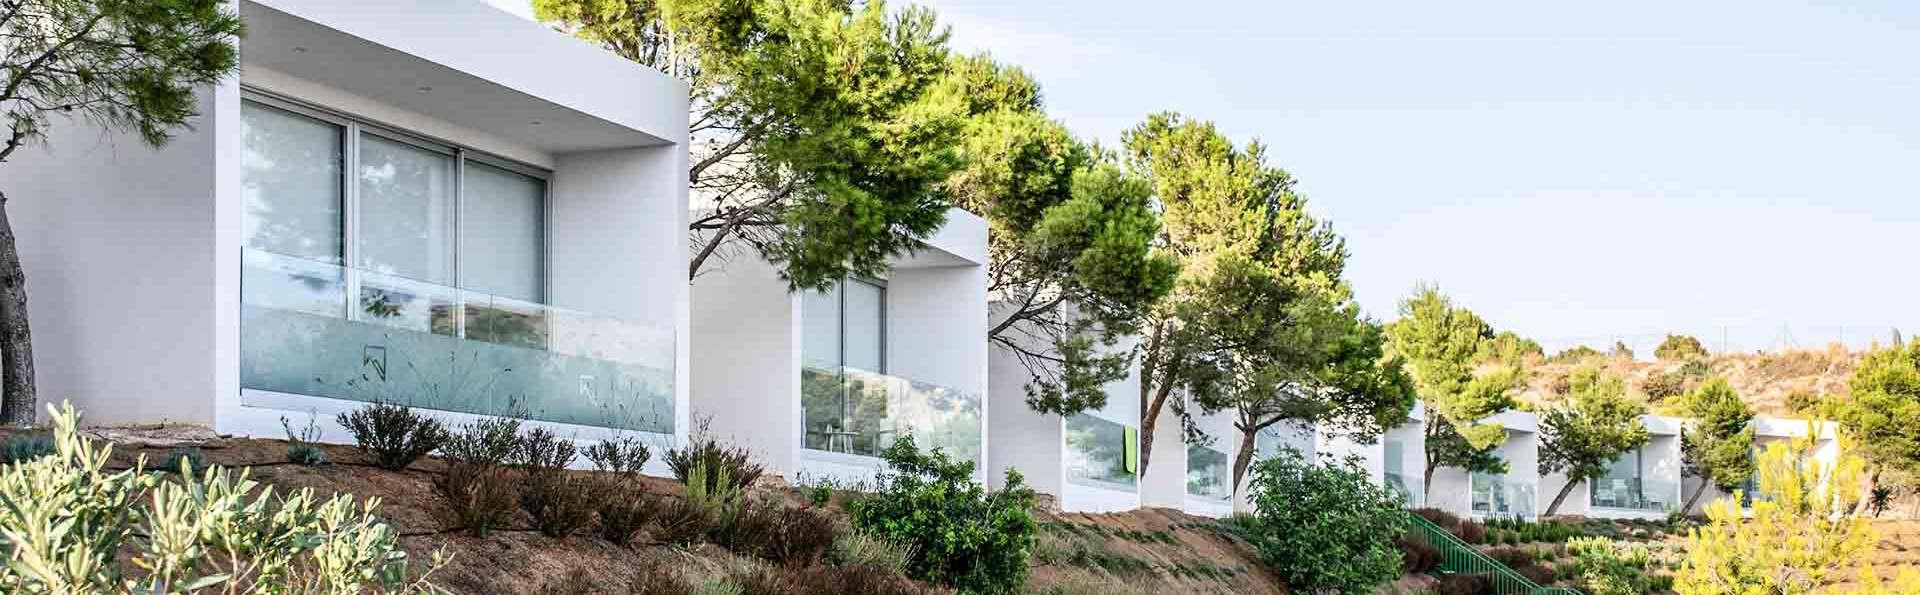 Puig Campana Nature Suites Hotel & BTT - EDIT_EXTERIOR_01.jpg